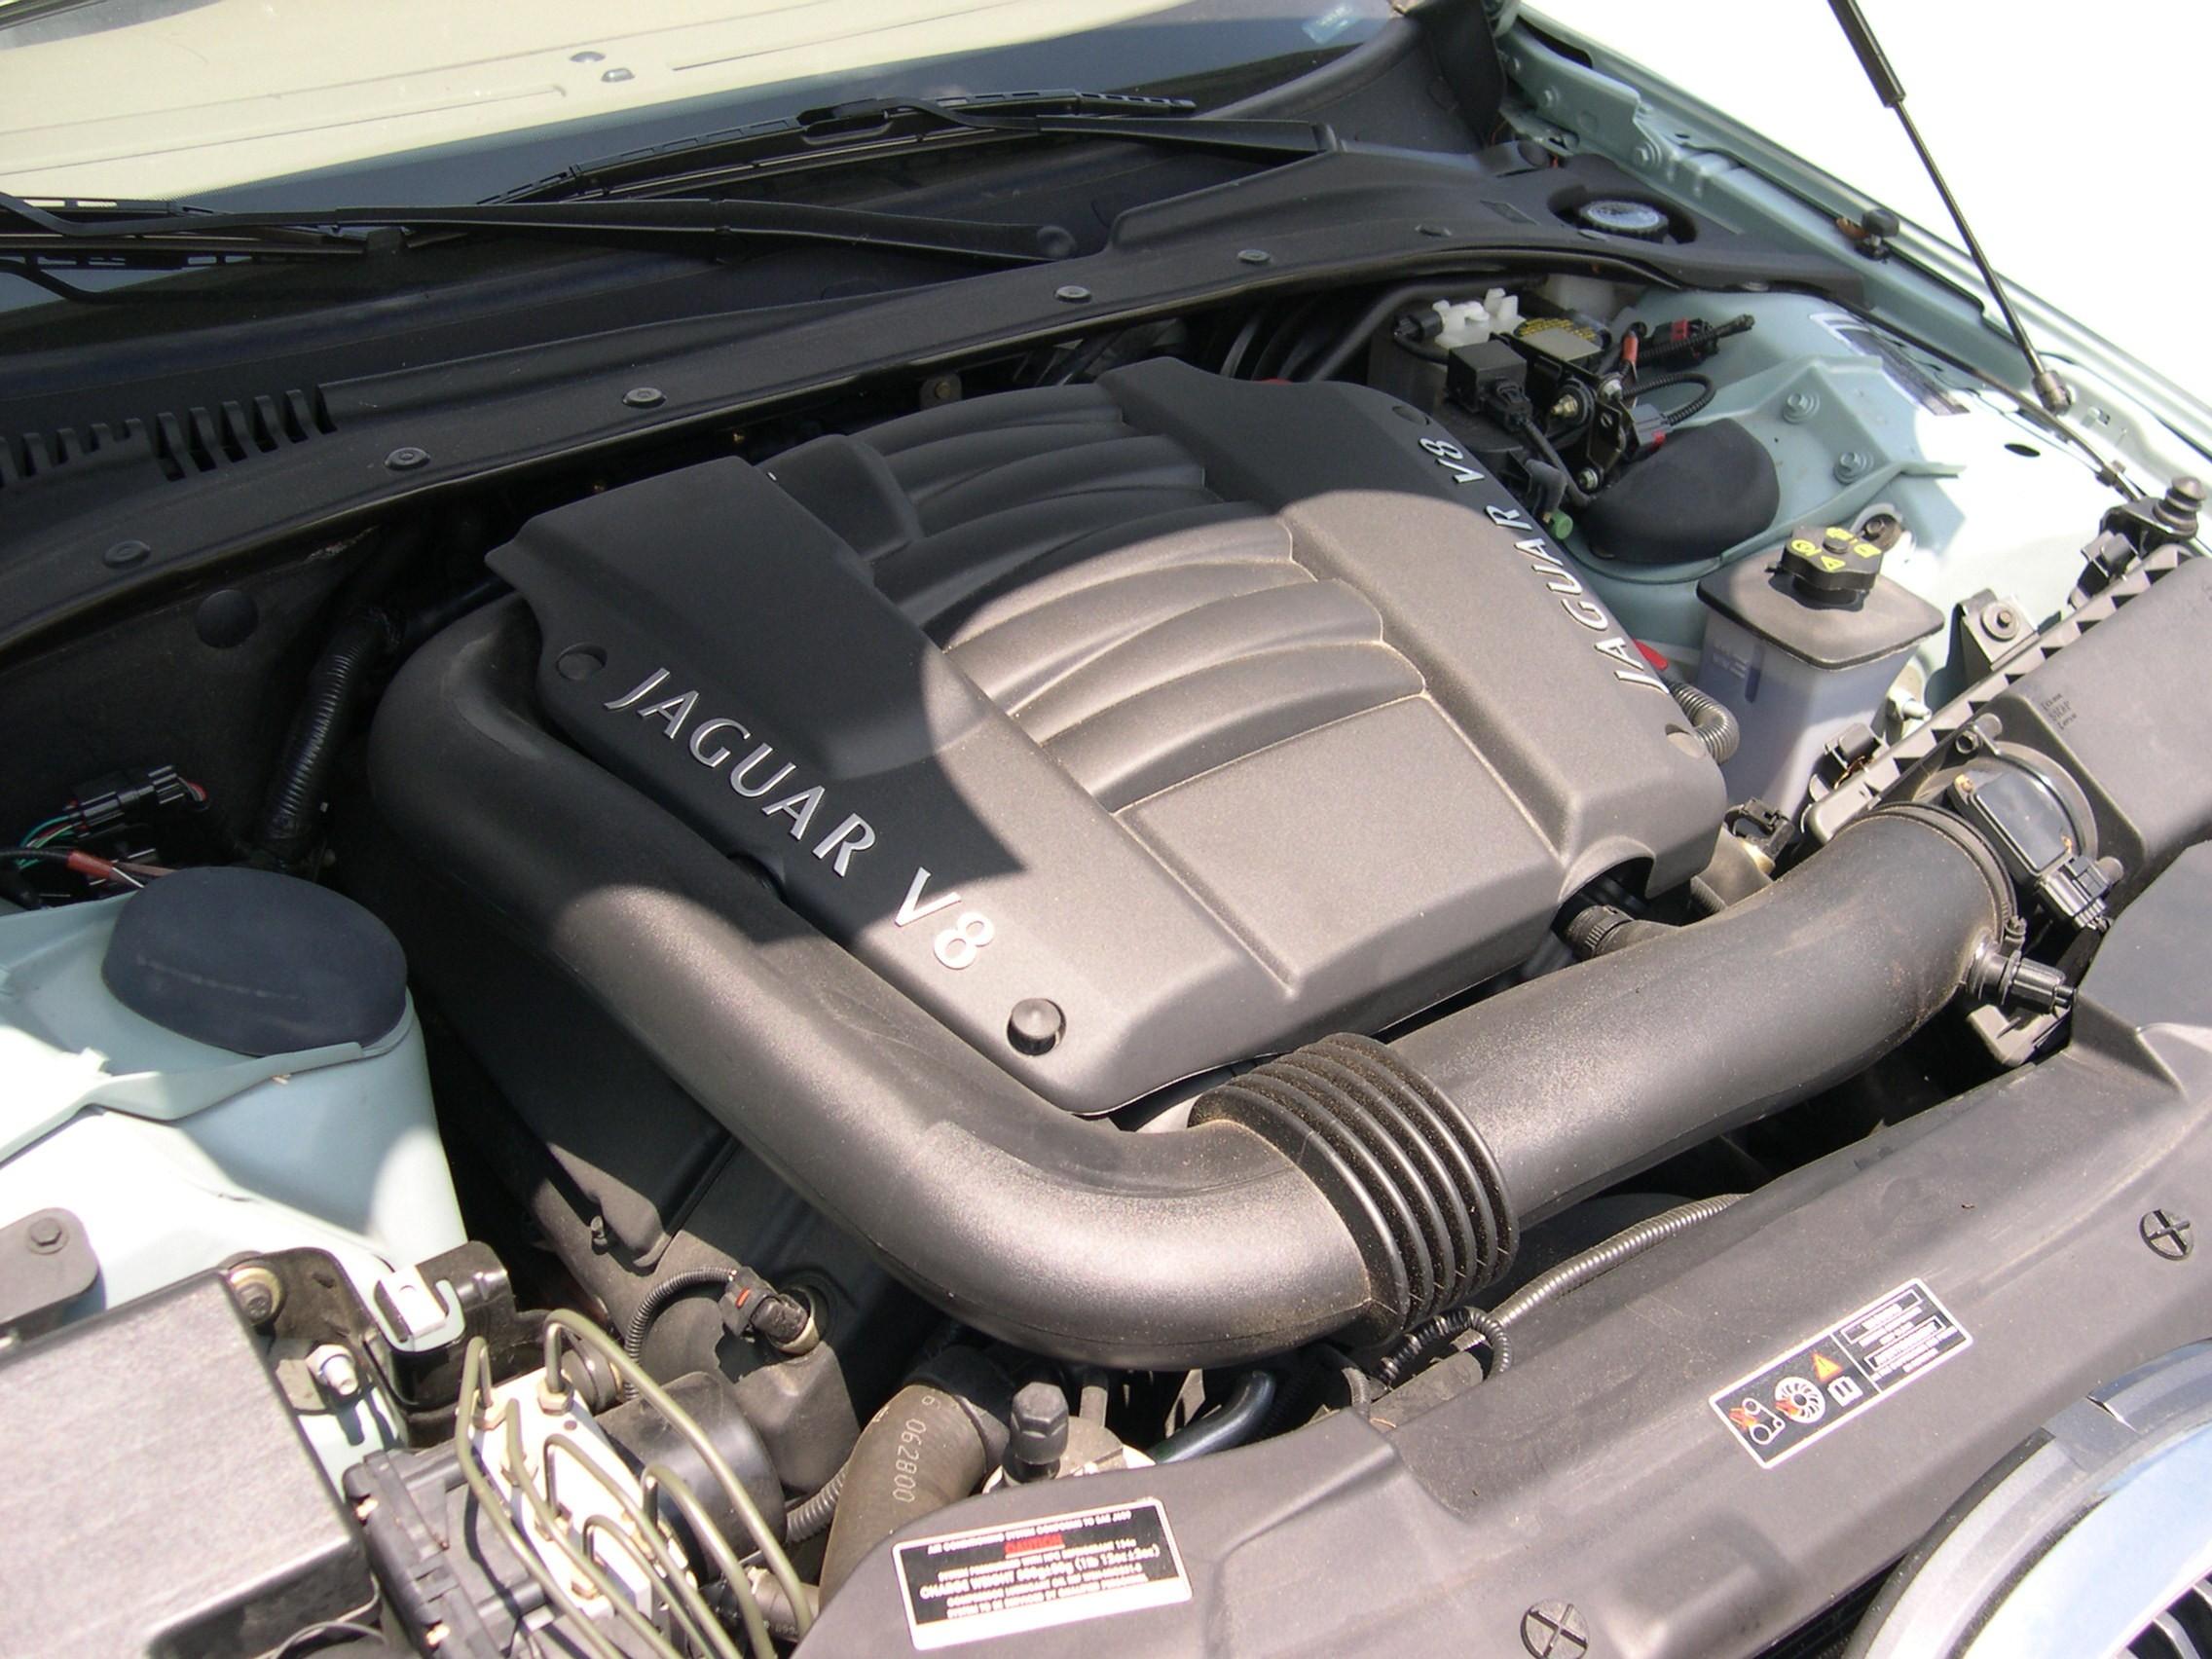 Jaguar X-type Engine Diagram Jaguar Engine Diagram Wiring Diagram Permanent A